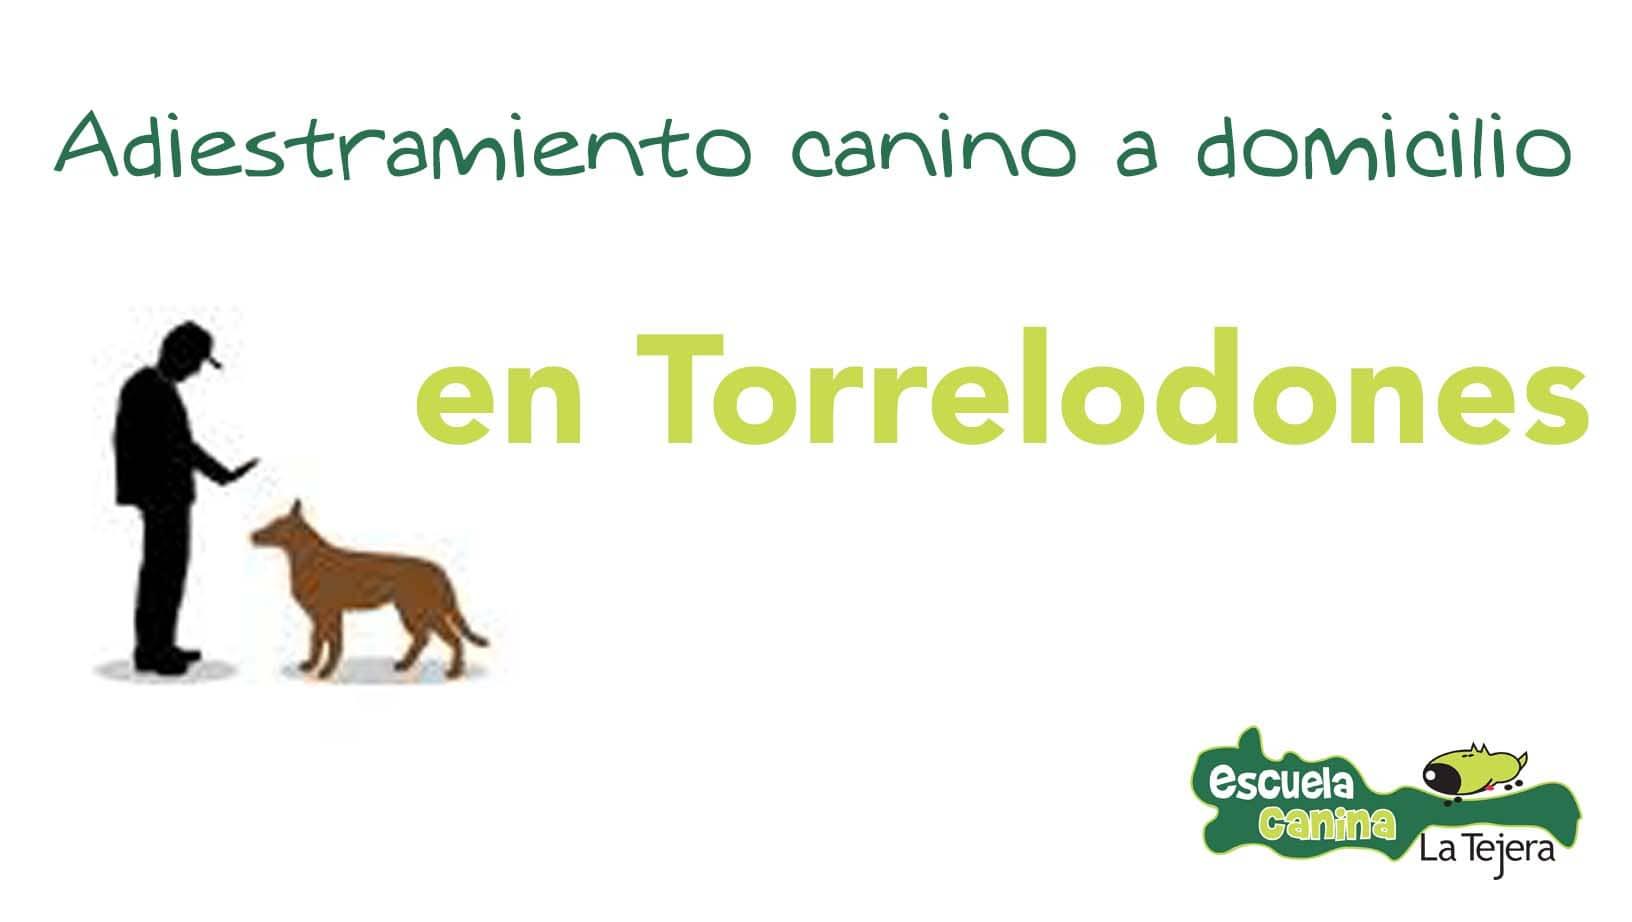 adiestramiento_domicilio_torrelodones